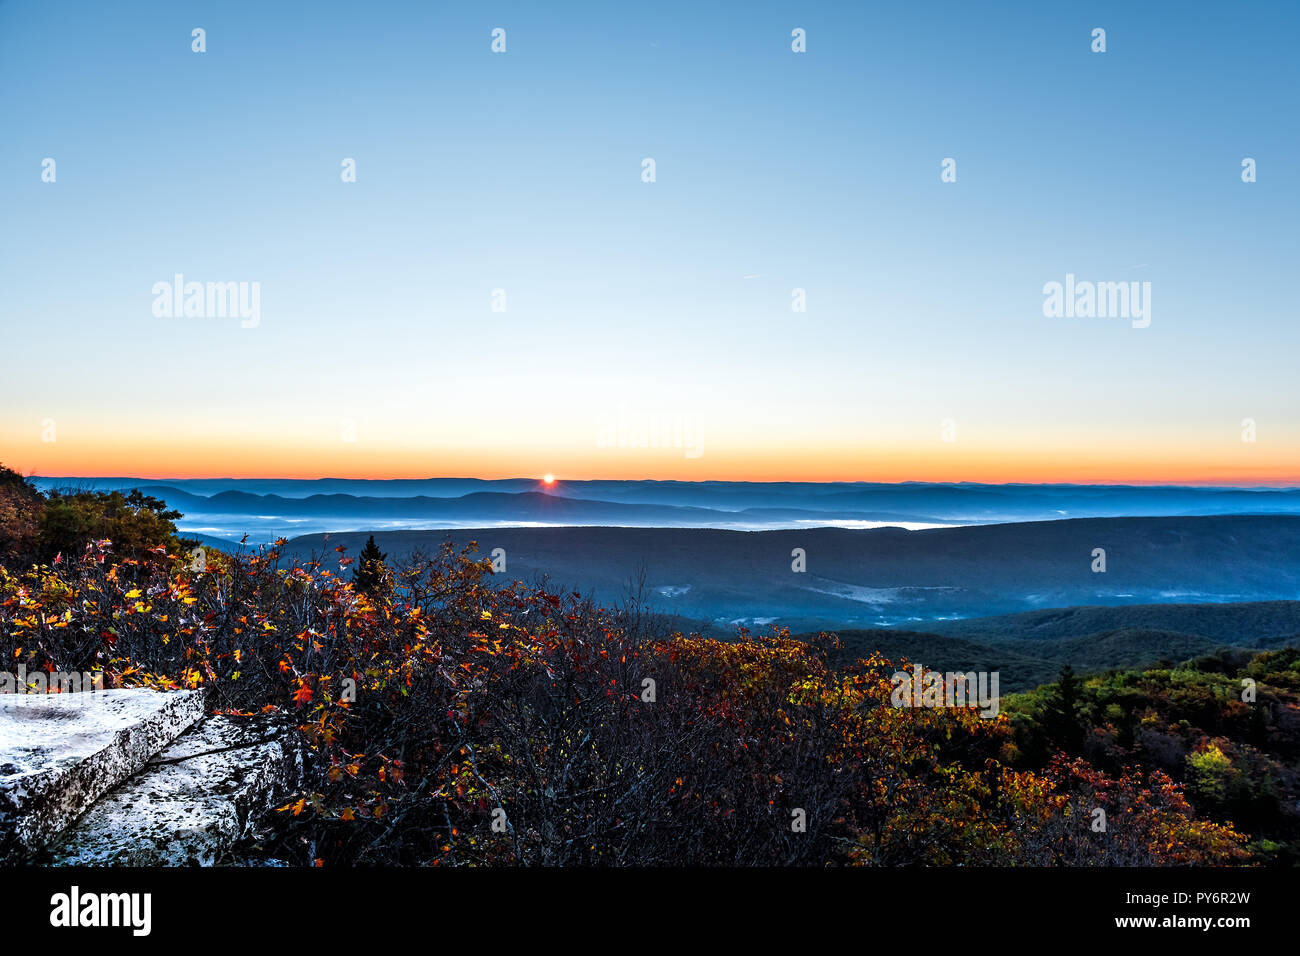 Bear rocks overlook sunrise, sunburst, sunrays, rays, sun behind mountains in autumn with rocky landscape in Dolly Sods, West Virginia with orange, ye Stock Photo